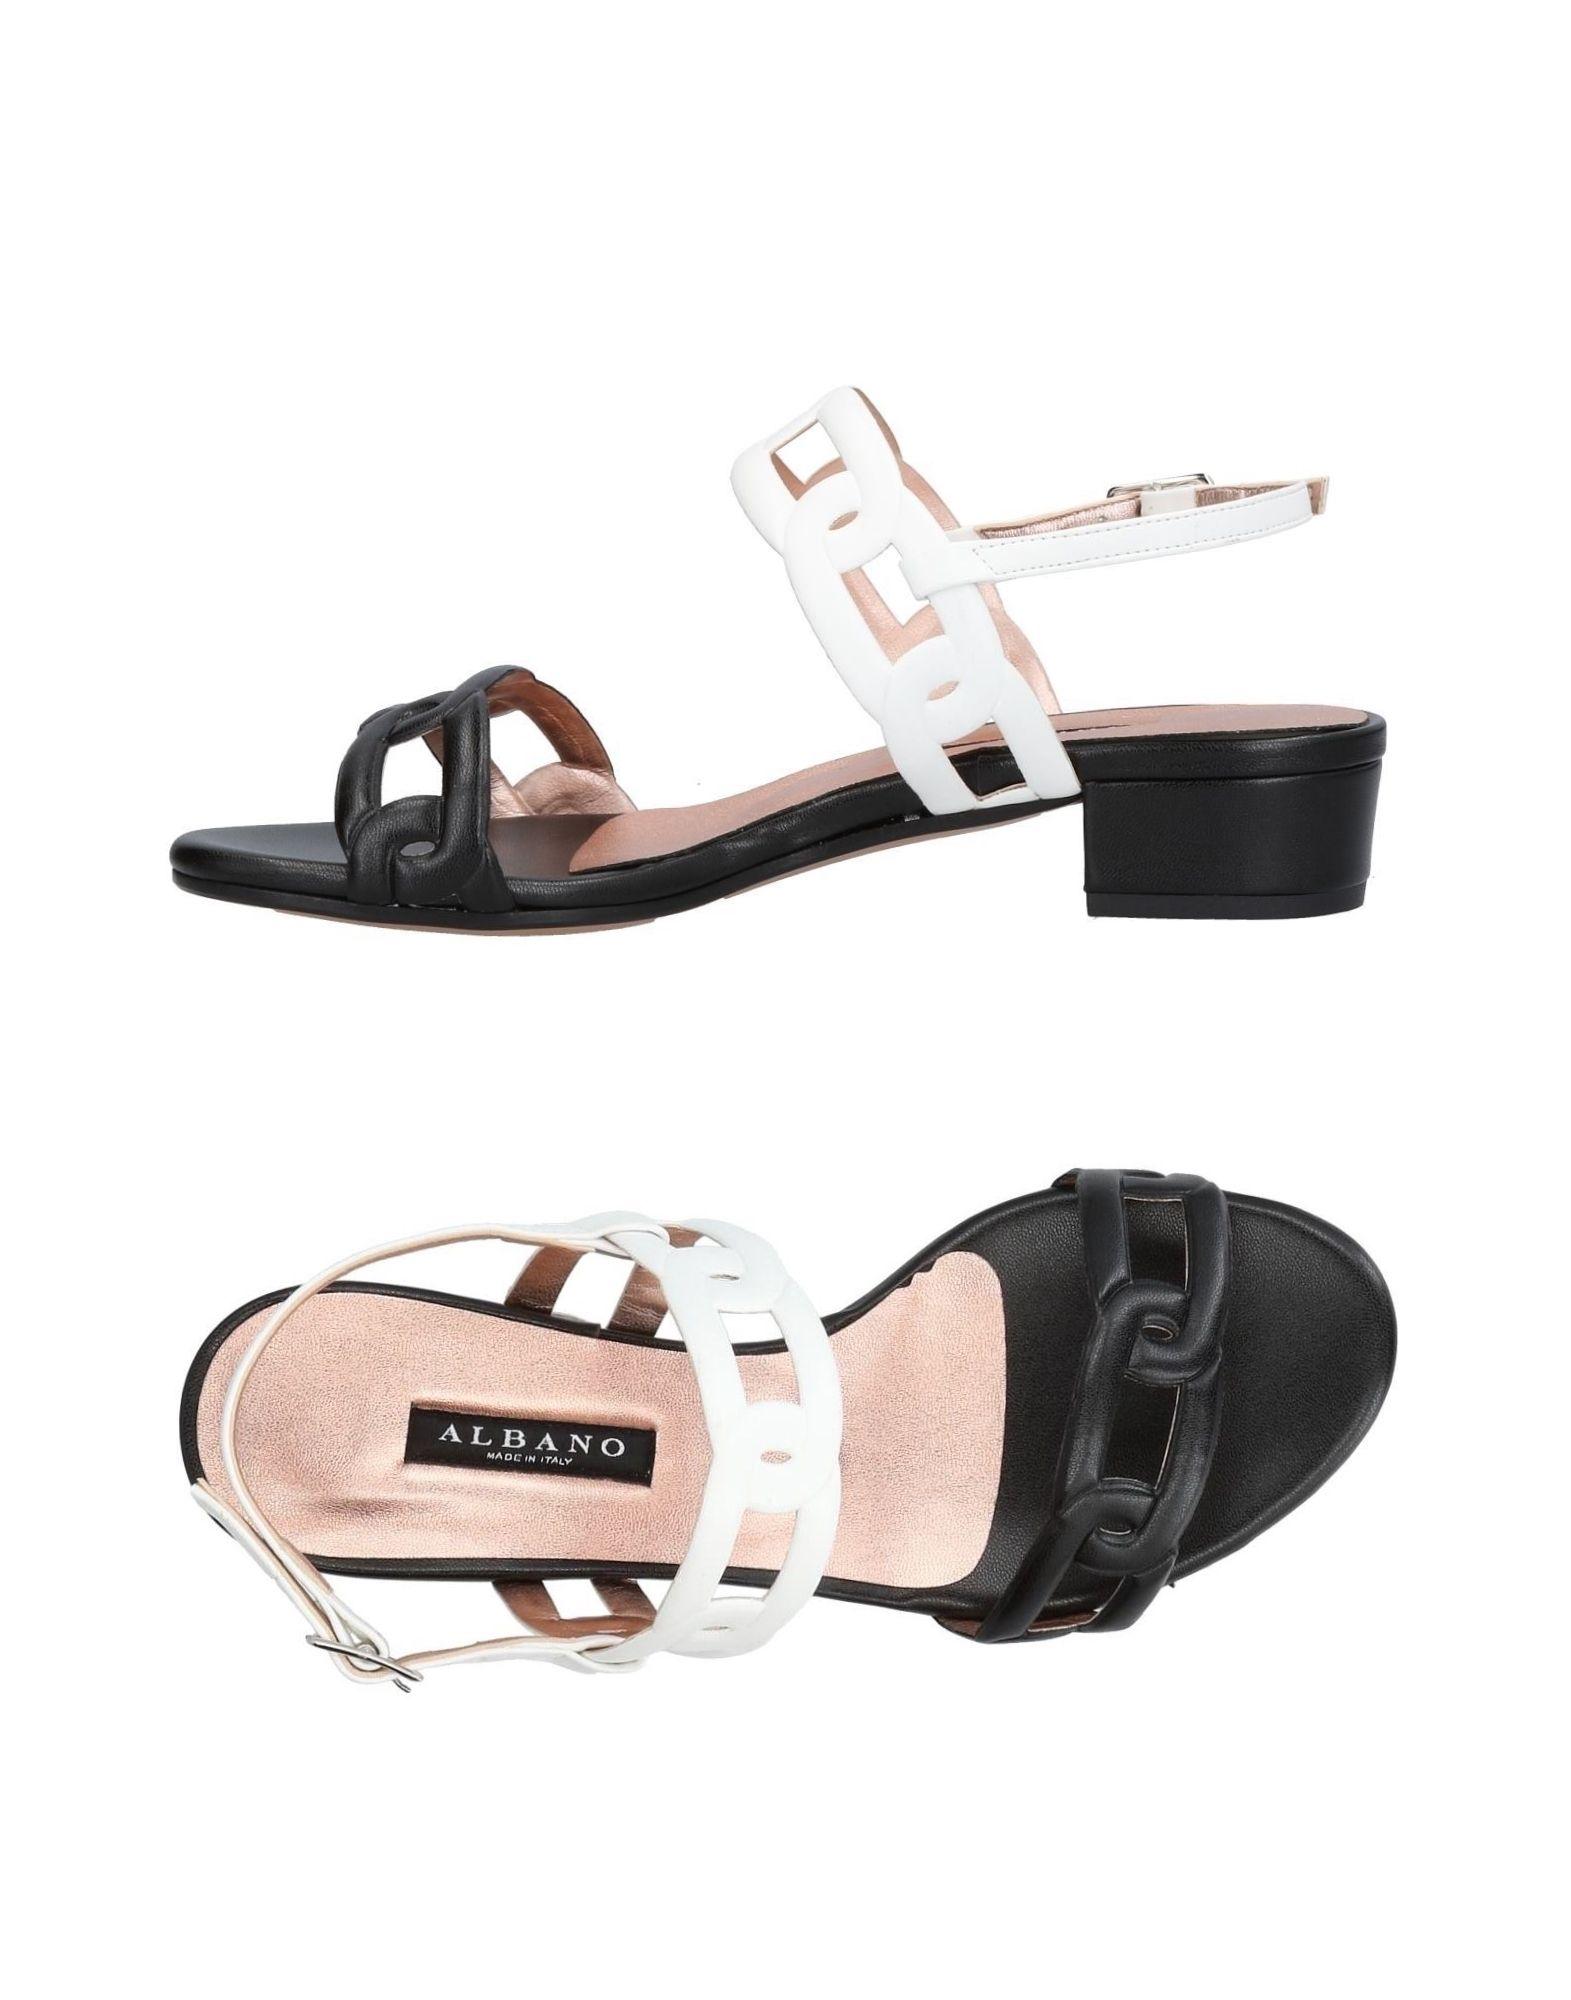 Albano Sandals Sandals - Women Albano Sandals Albano online on  United Kingdom - 11456194AH 4f49f0